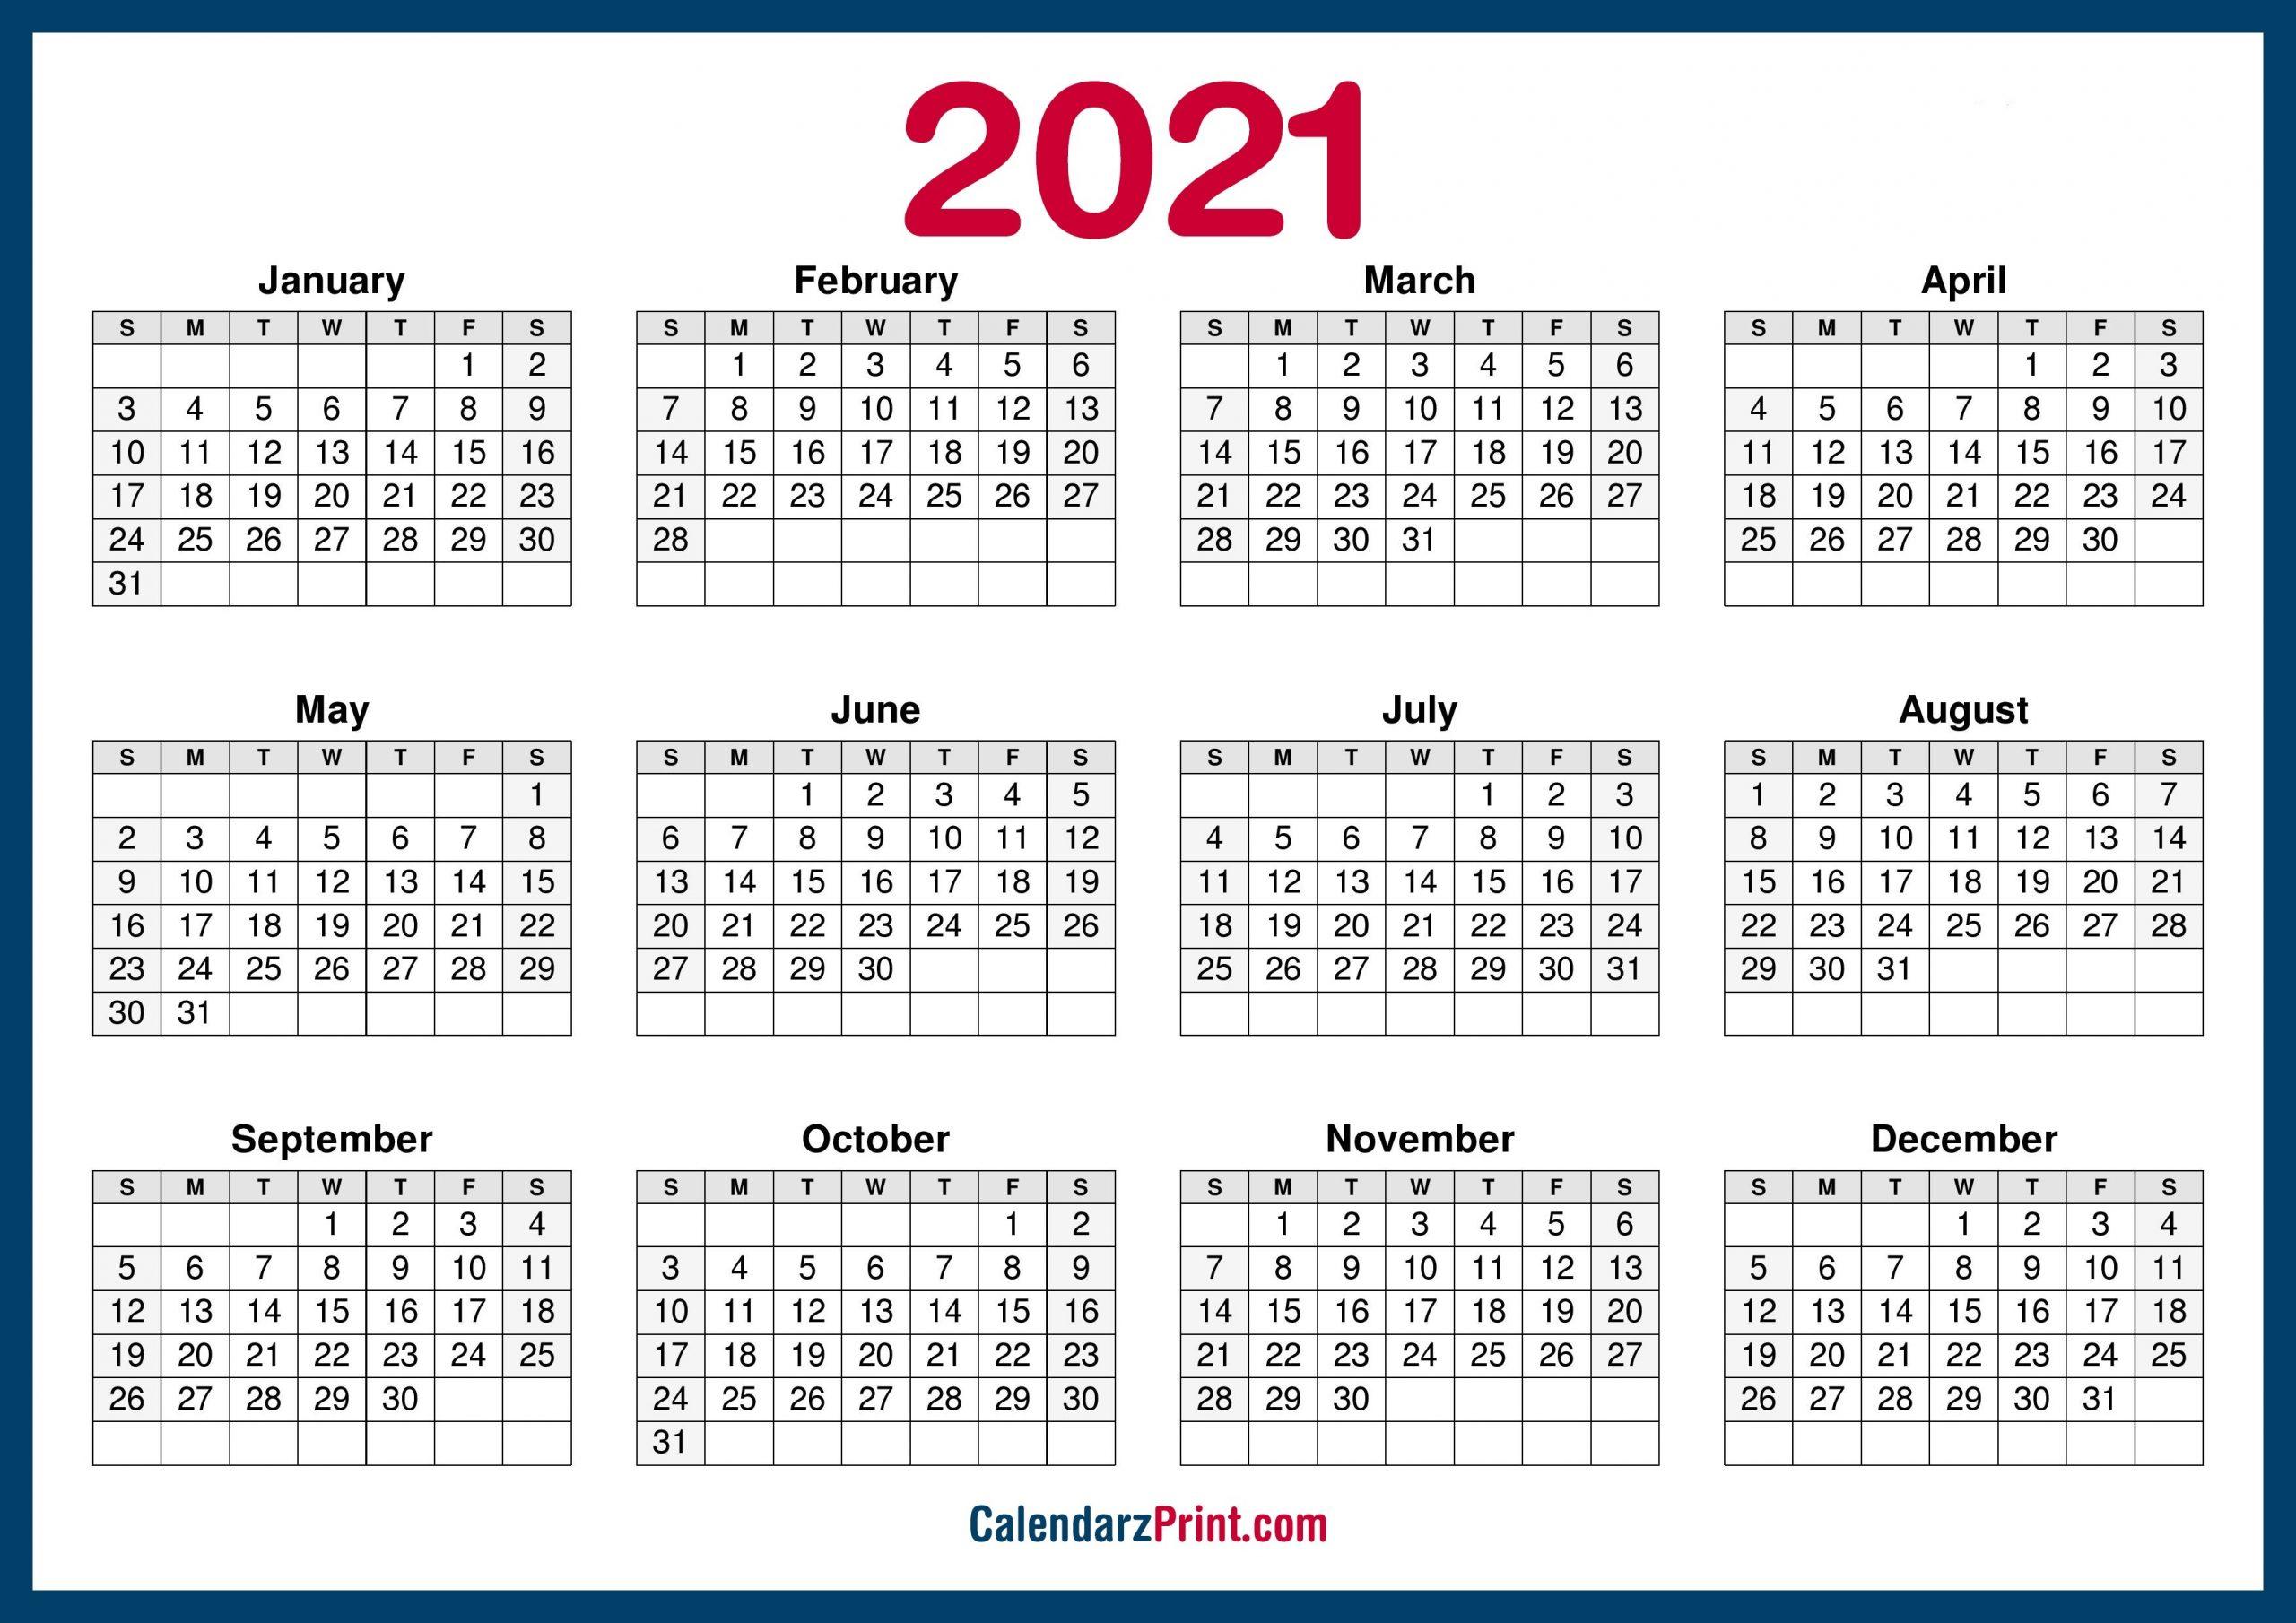 2021 Calendar Printable Free, Horizontal, Hd, Navy Blue – Calendarzprint | Free Calendars-Sunday To Saturday Calendar 2021 Printable